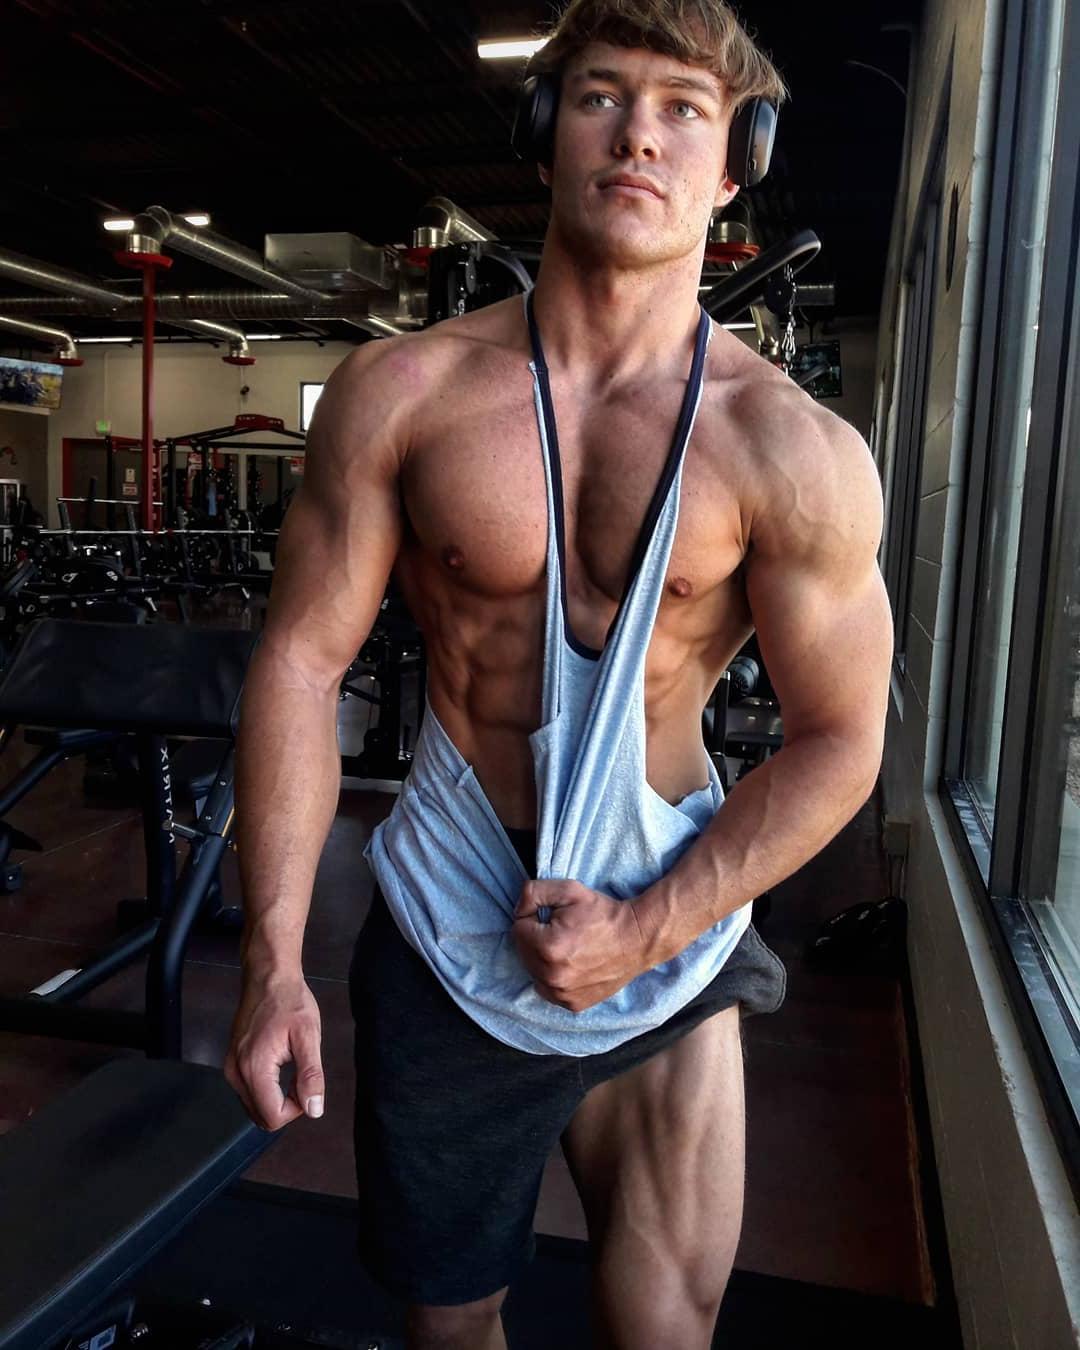 young-gym-hunk-jason-bjarnson-swole-muscular-body-sexy-strong-alpha-bad-boy